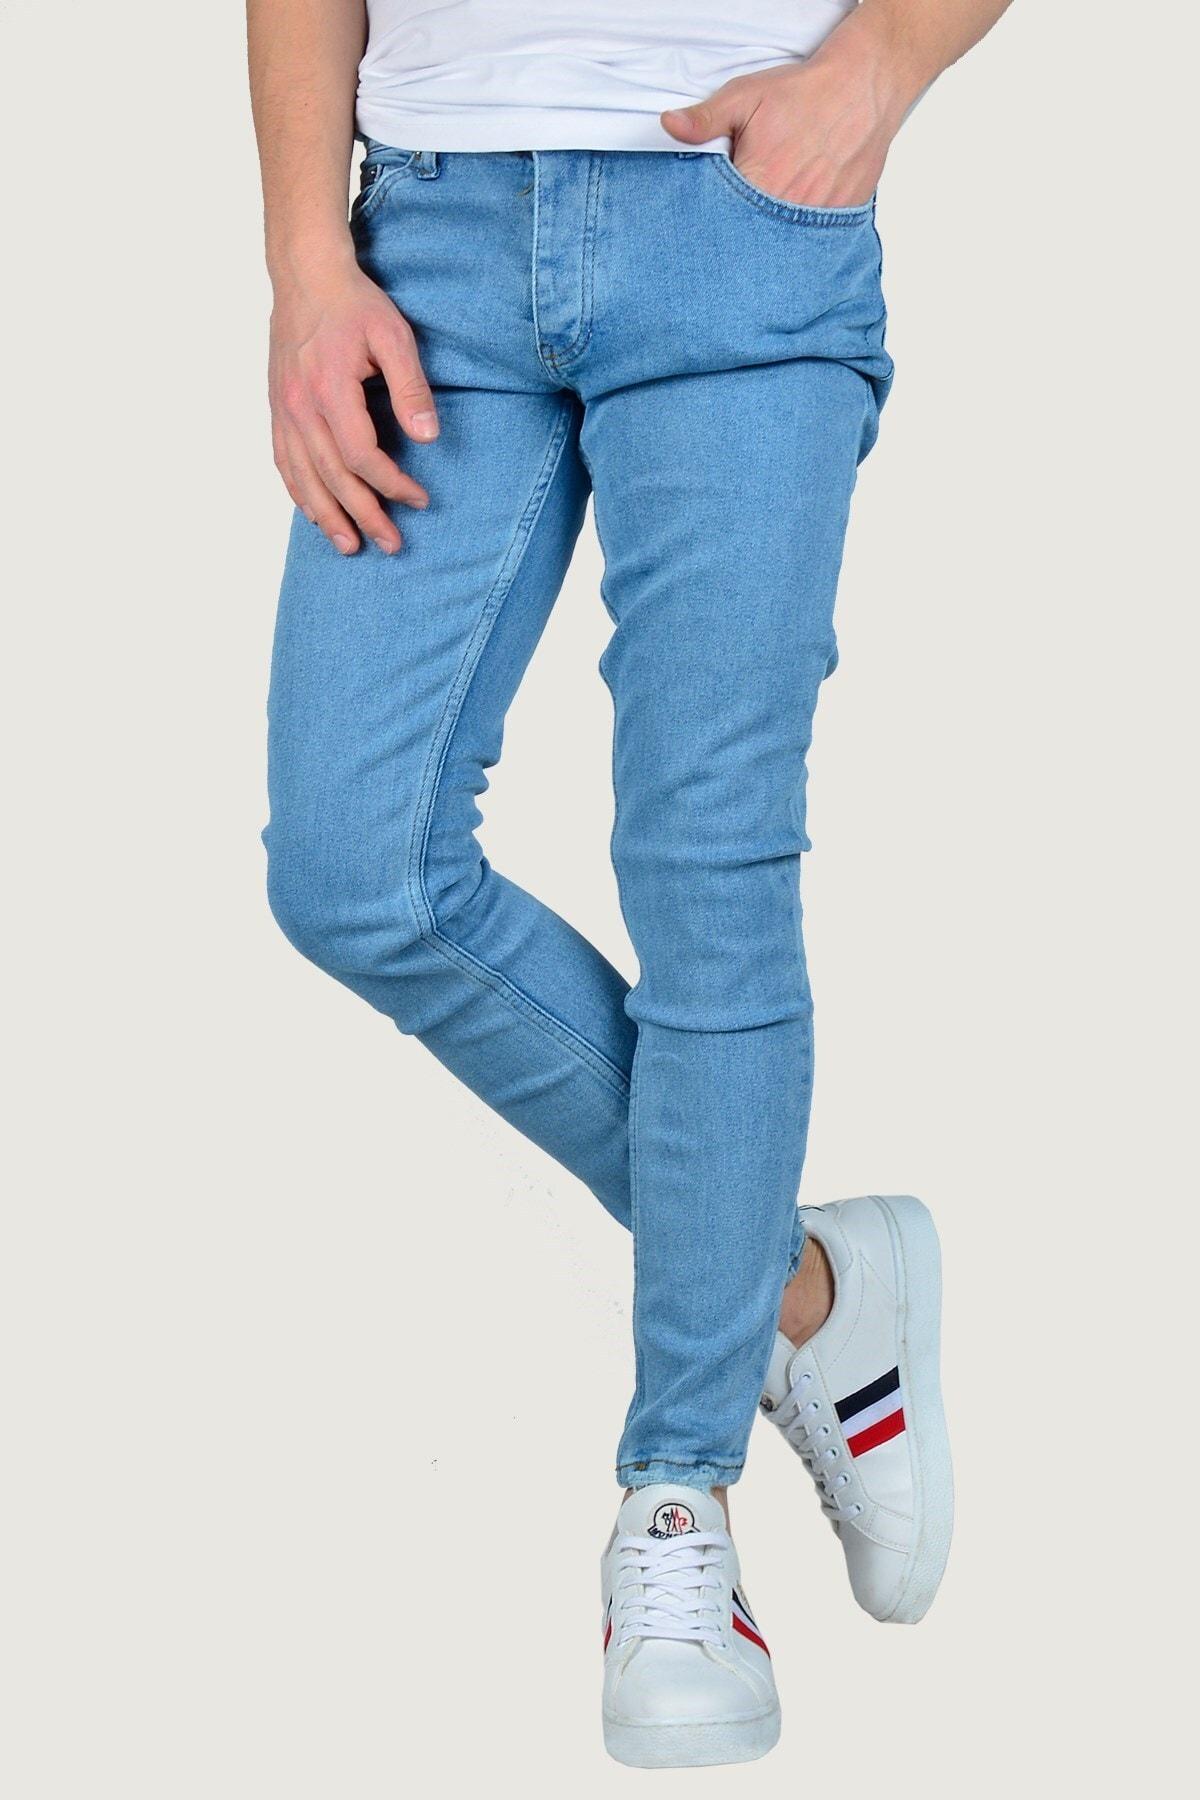 Terapi Men Erkek Kot Pantolon 8K-2100306-004-1 Buz Mavisi 0